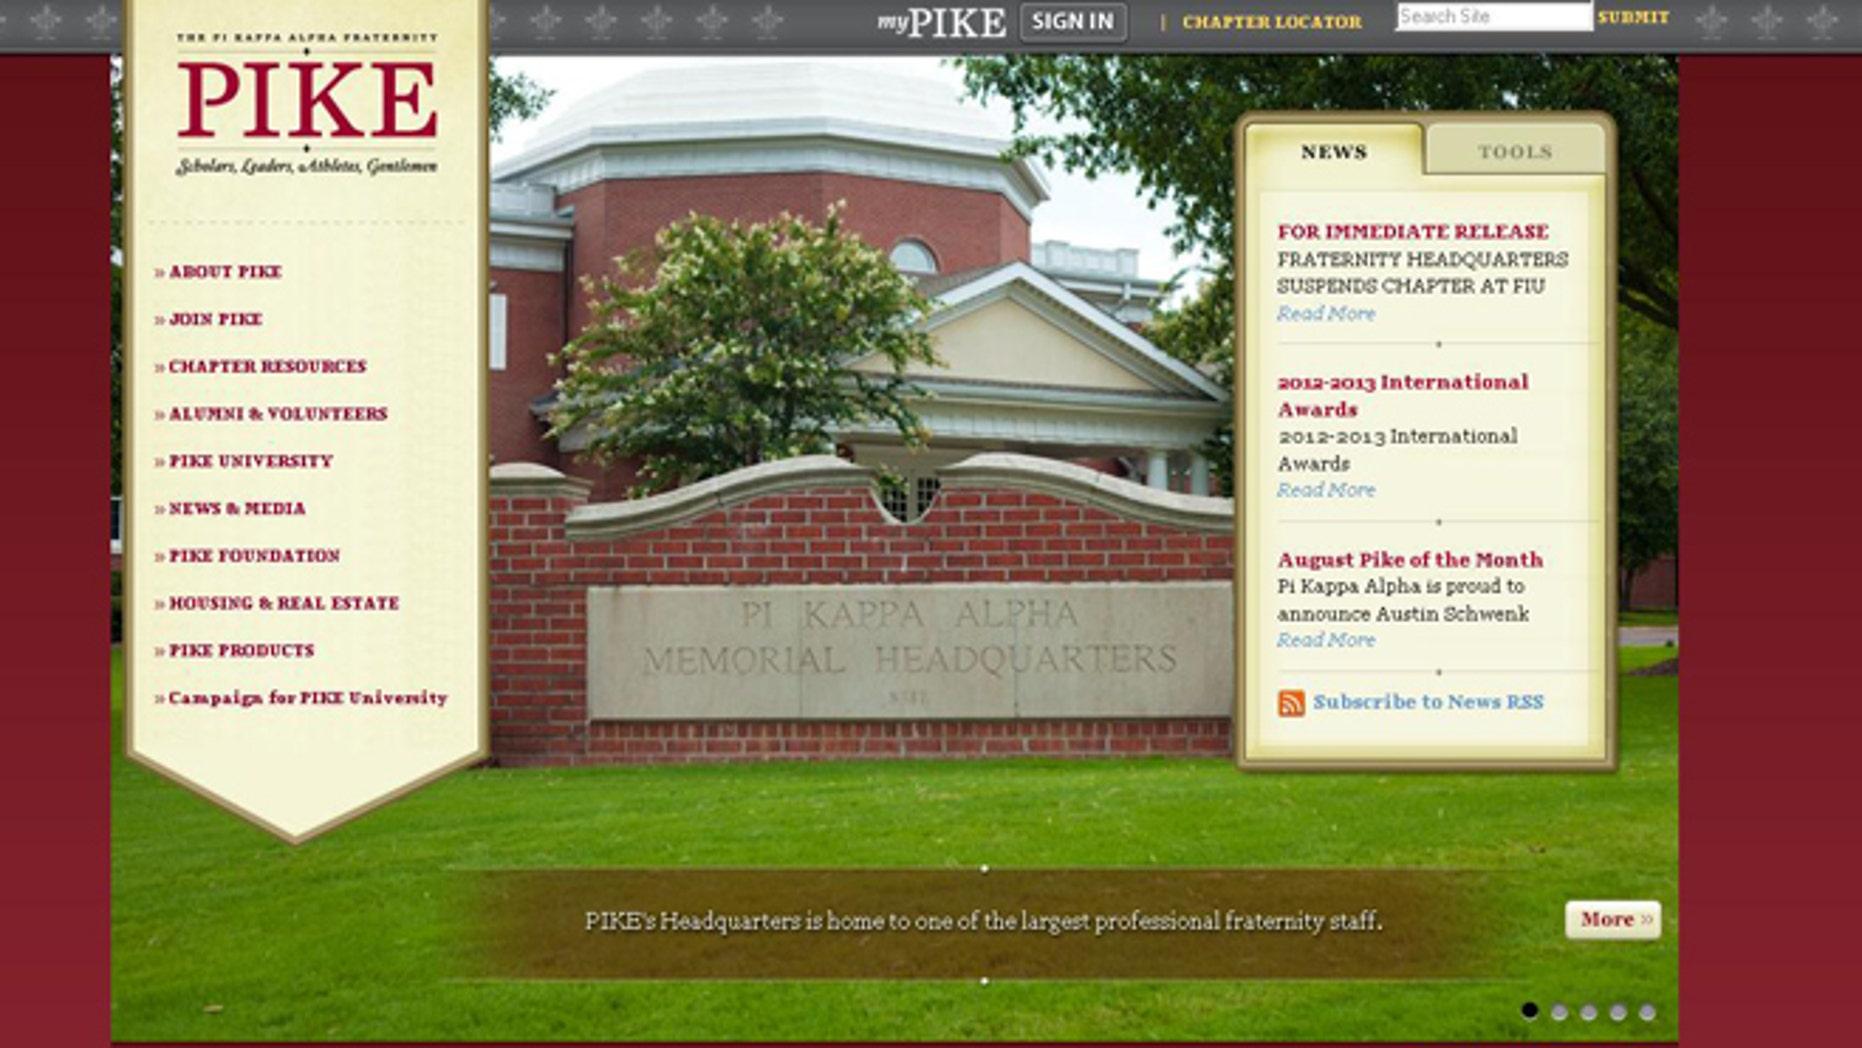 The Pi Kappa Alpha Fraternity's website.